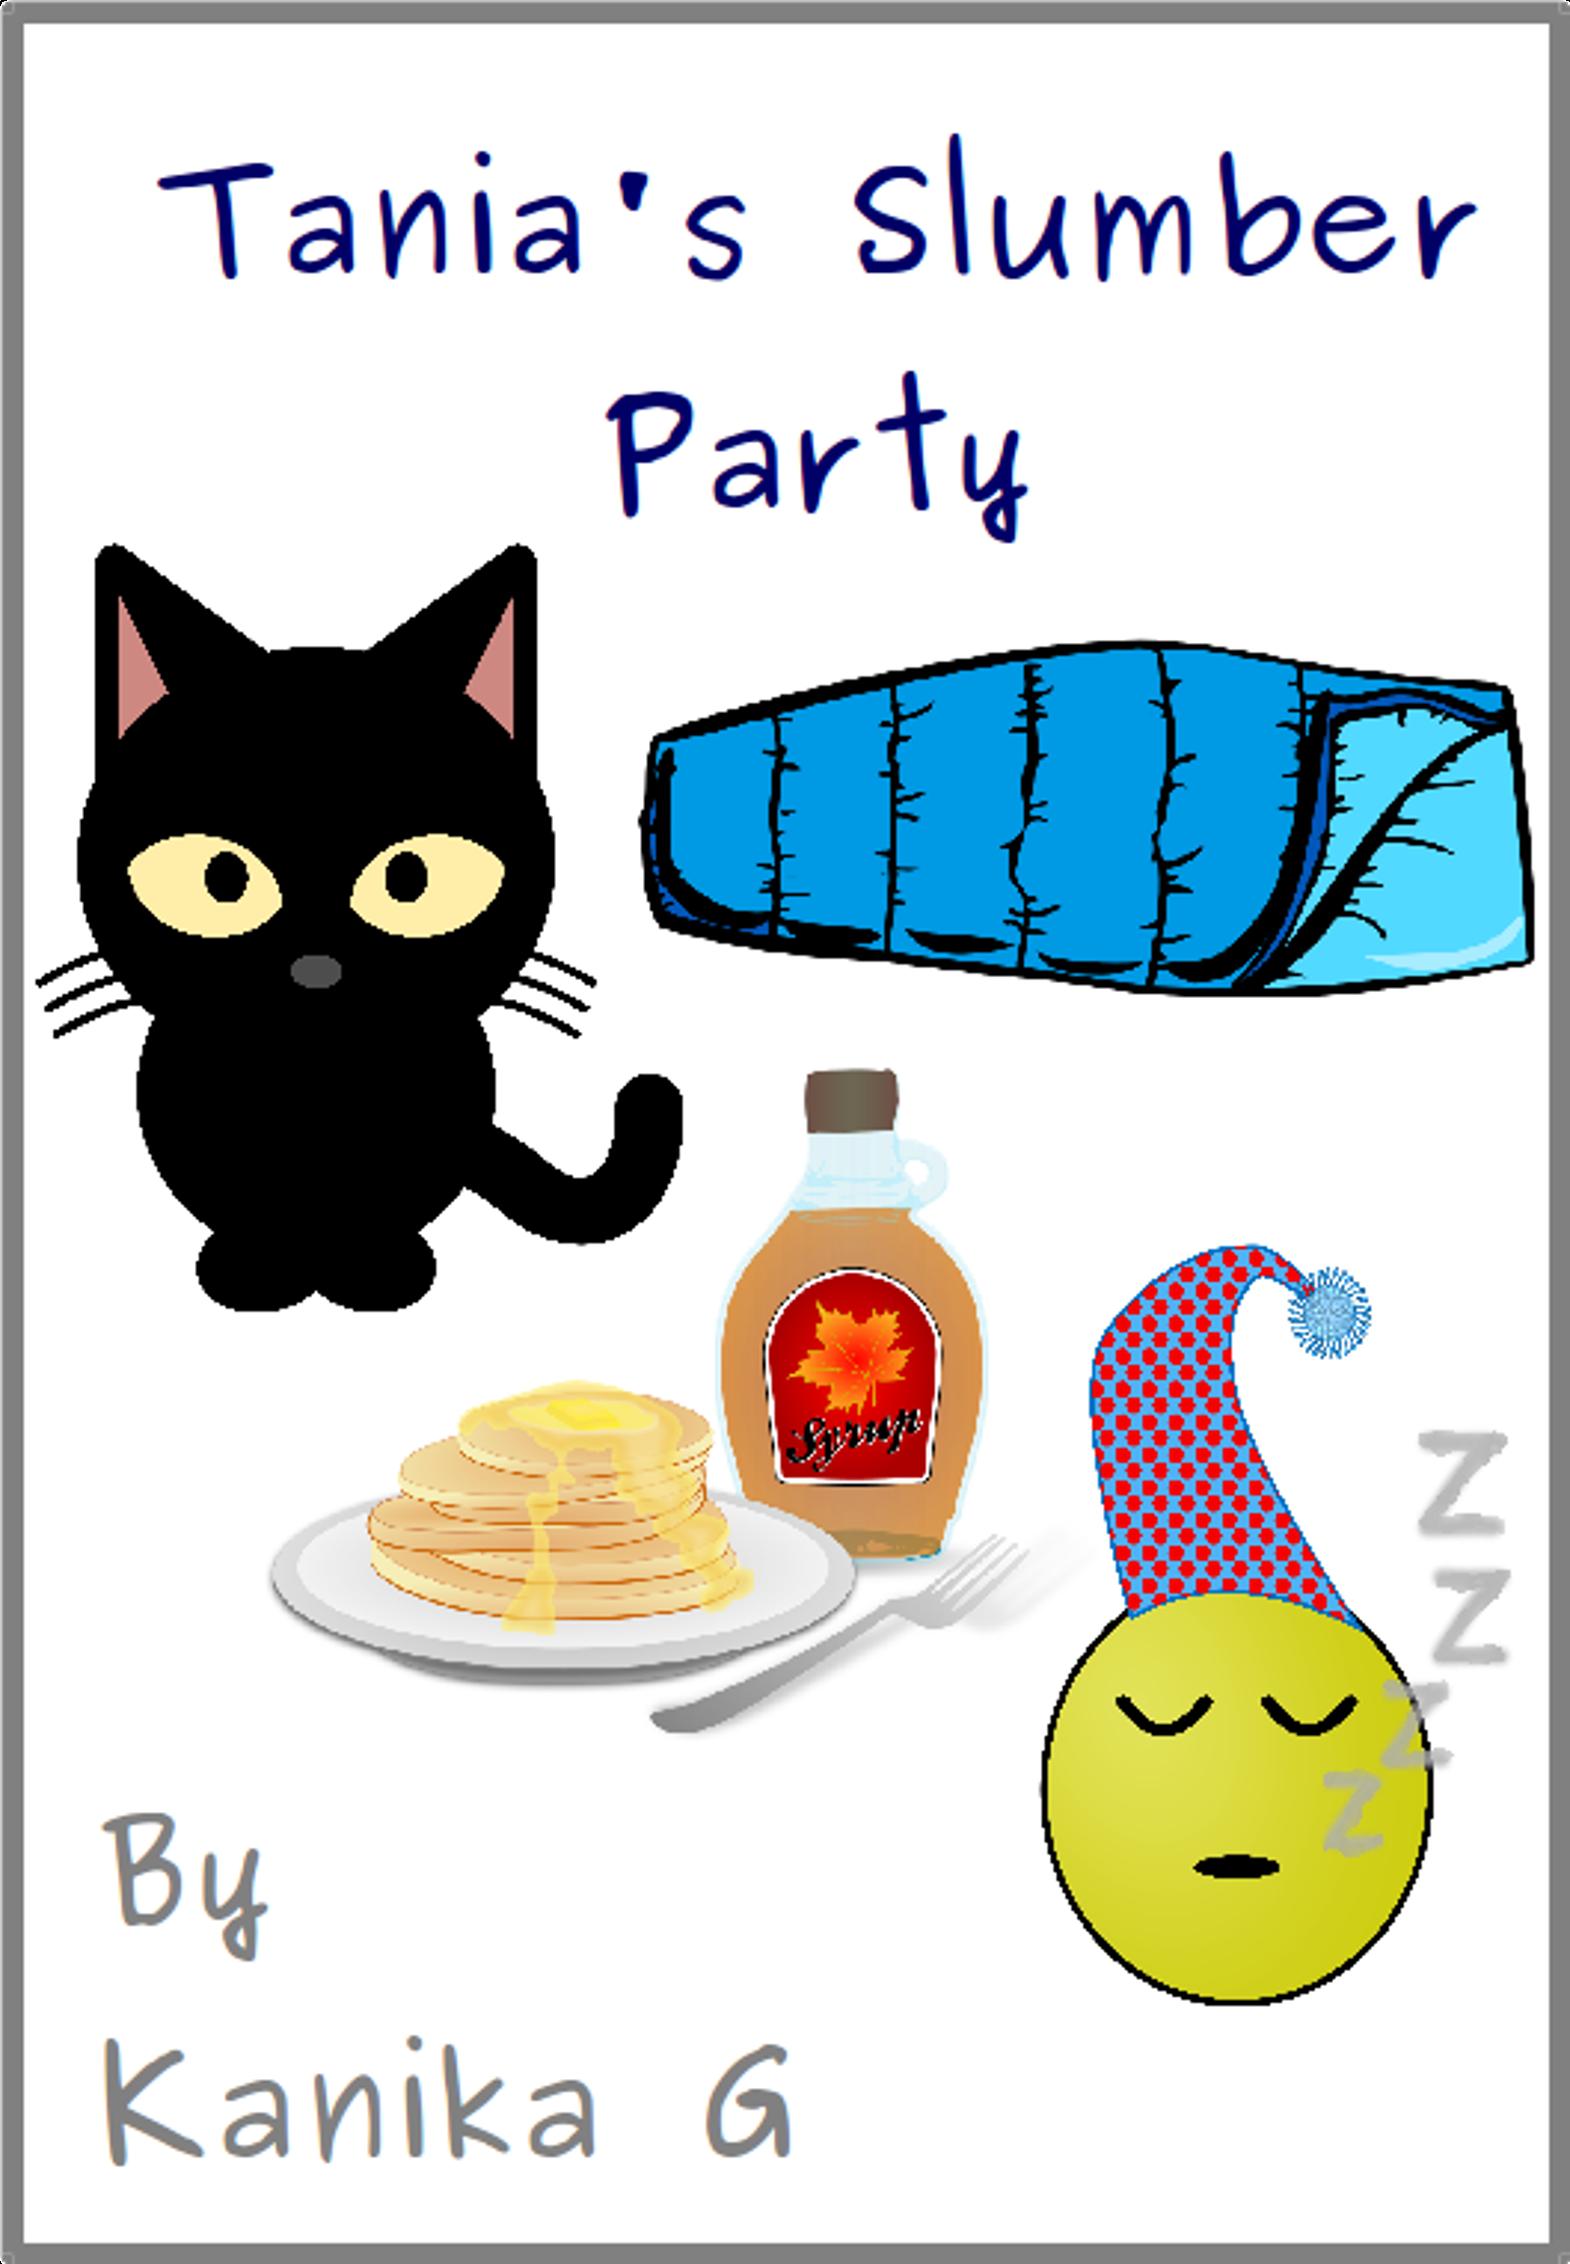 Tania's Slumber Party by G, Kanika